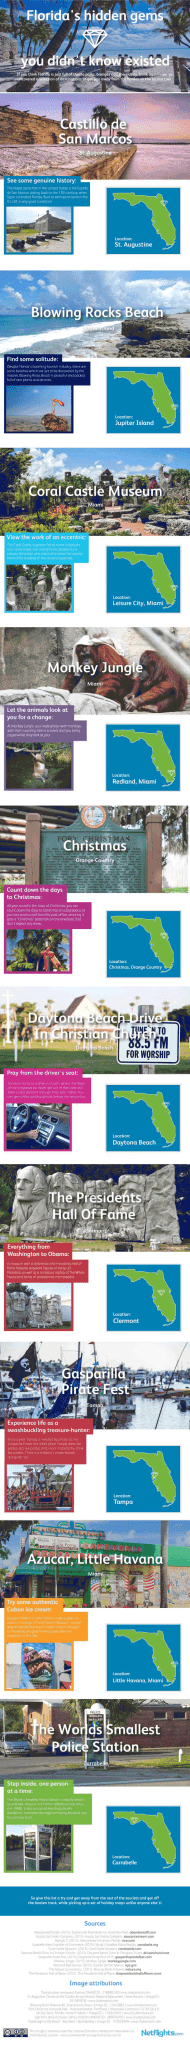 Florida's hidden gems for travelers infographic